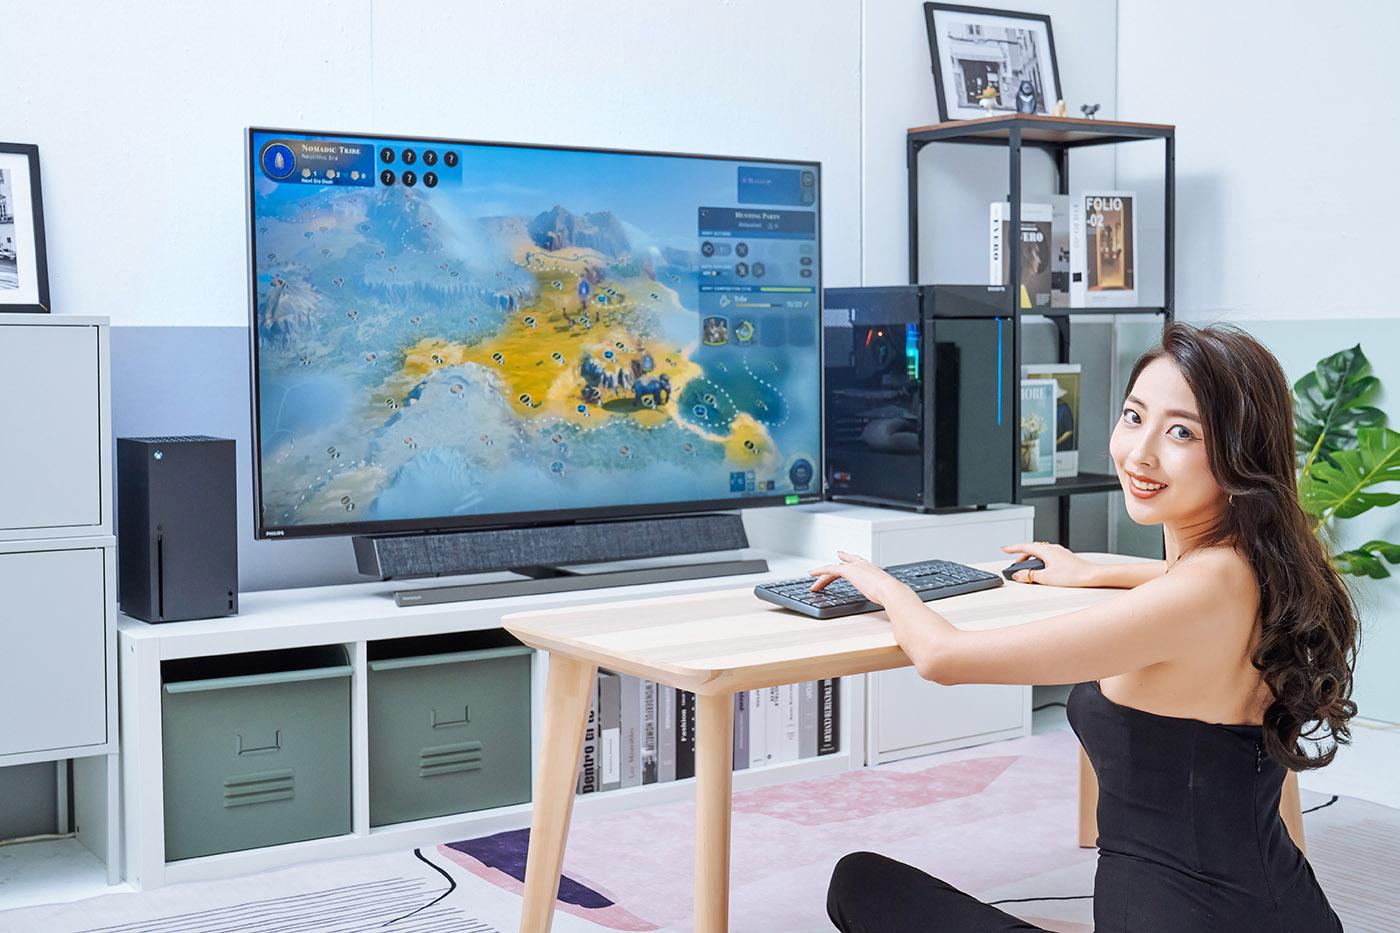 559M1RYV 連接 PC 主機的遊戲體驗也同樣優秀,4K 超細膩的影像效果,加上 144Hz 的畫面更新率,在移動畫面過程中,所有遊戲中的人物與物件都能保持清晰呈現,特別是主視角射擊遊戲時,要查找敵人的位置,或是辨識遠處的目標,也都變得更加容易。